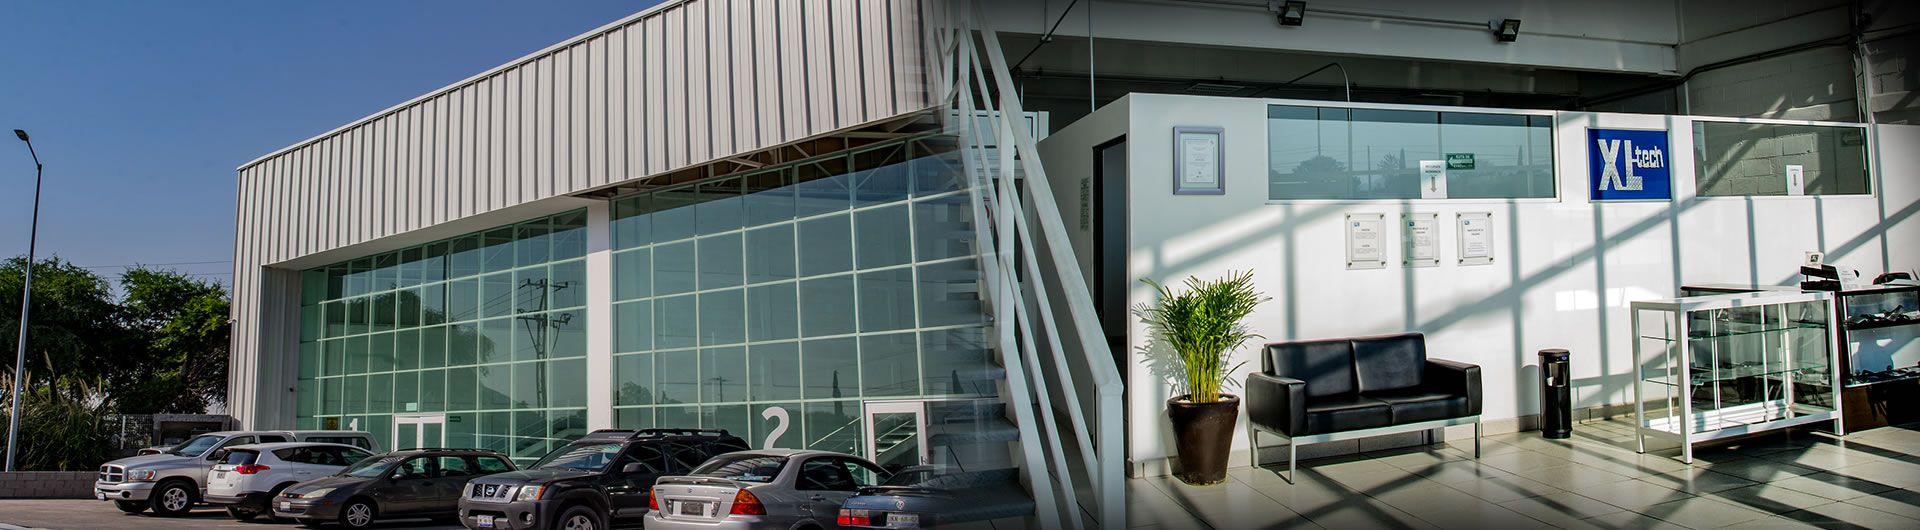 Building exterior and lobby interior